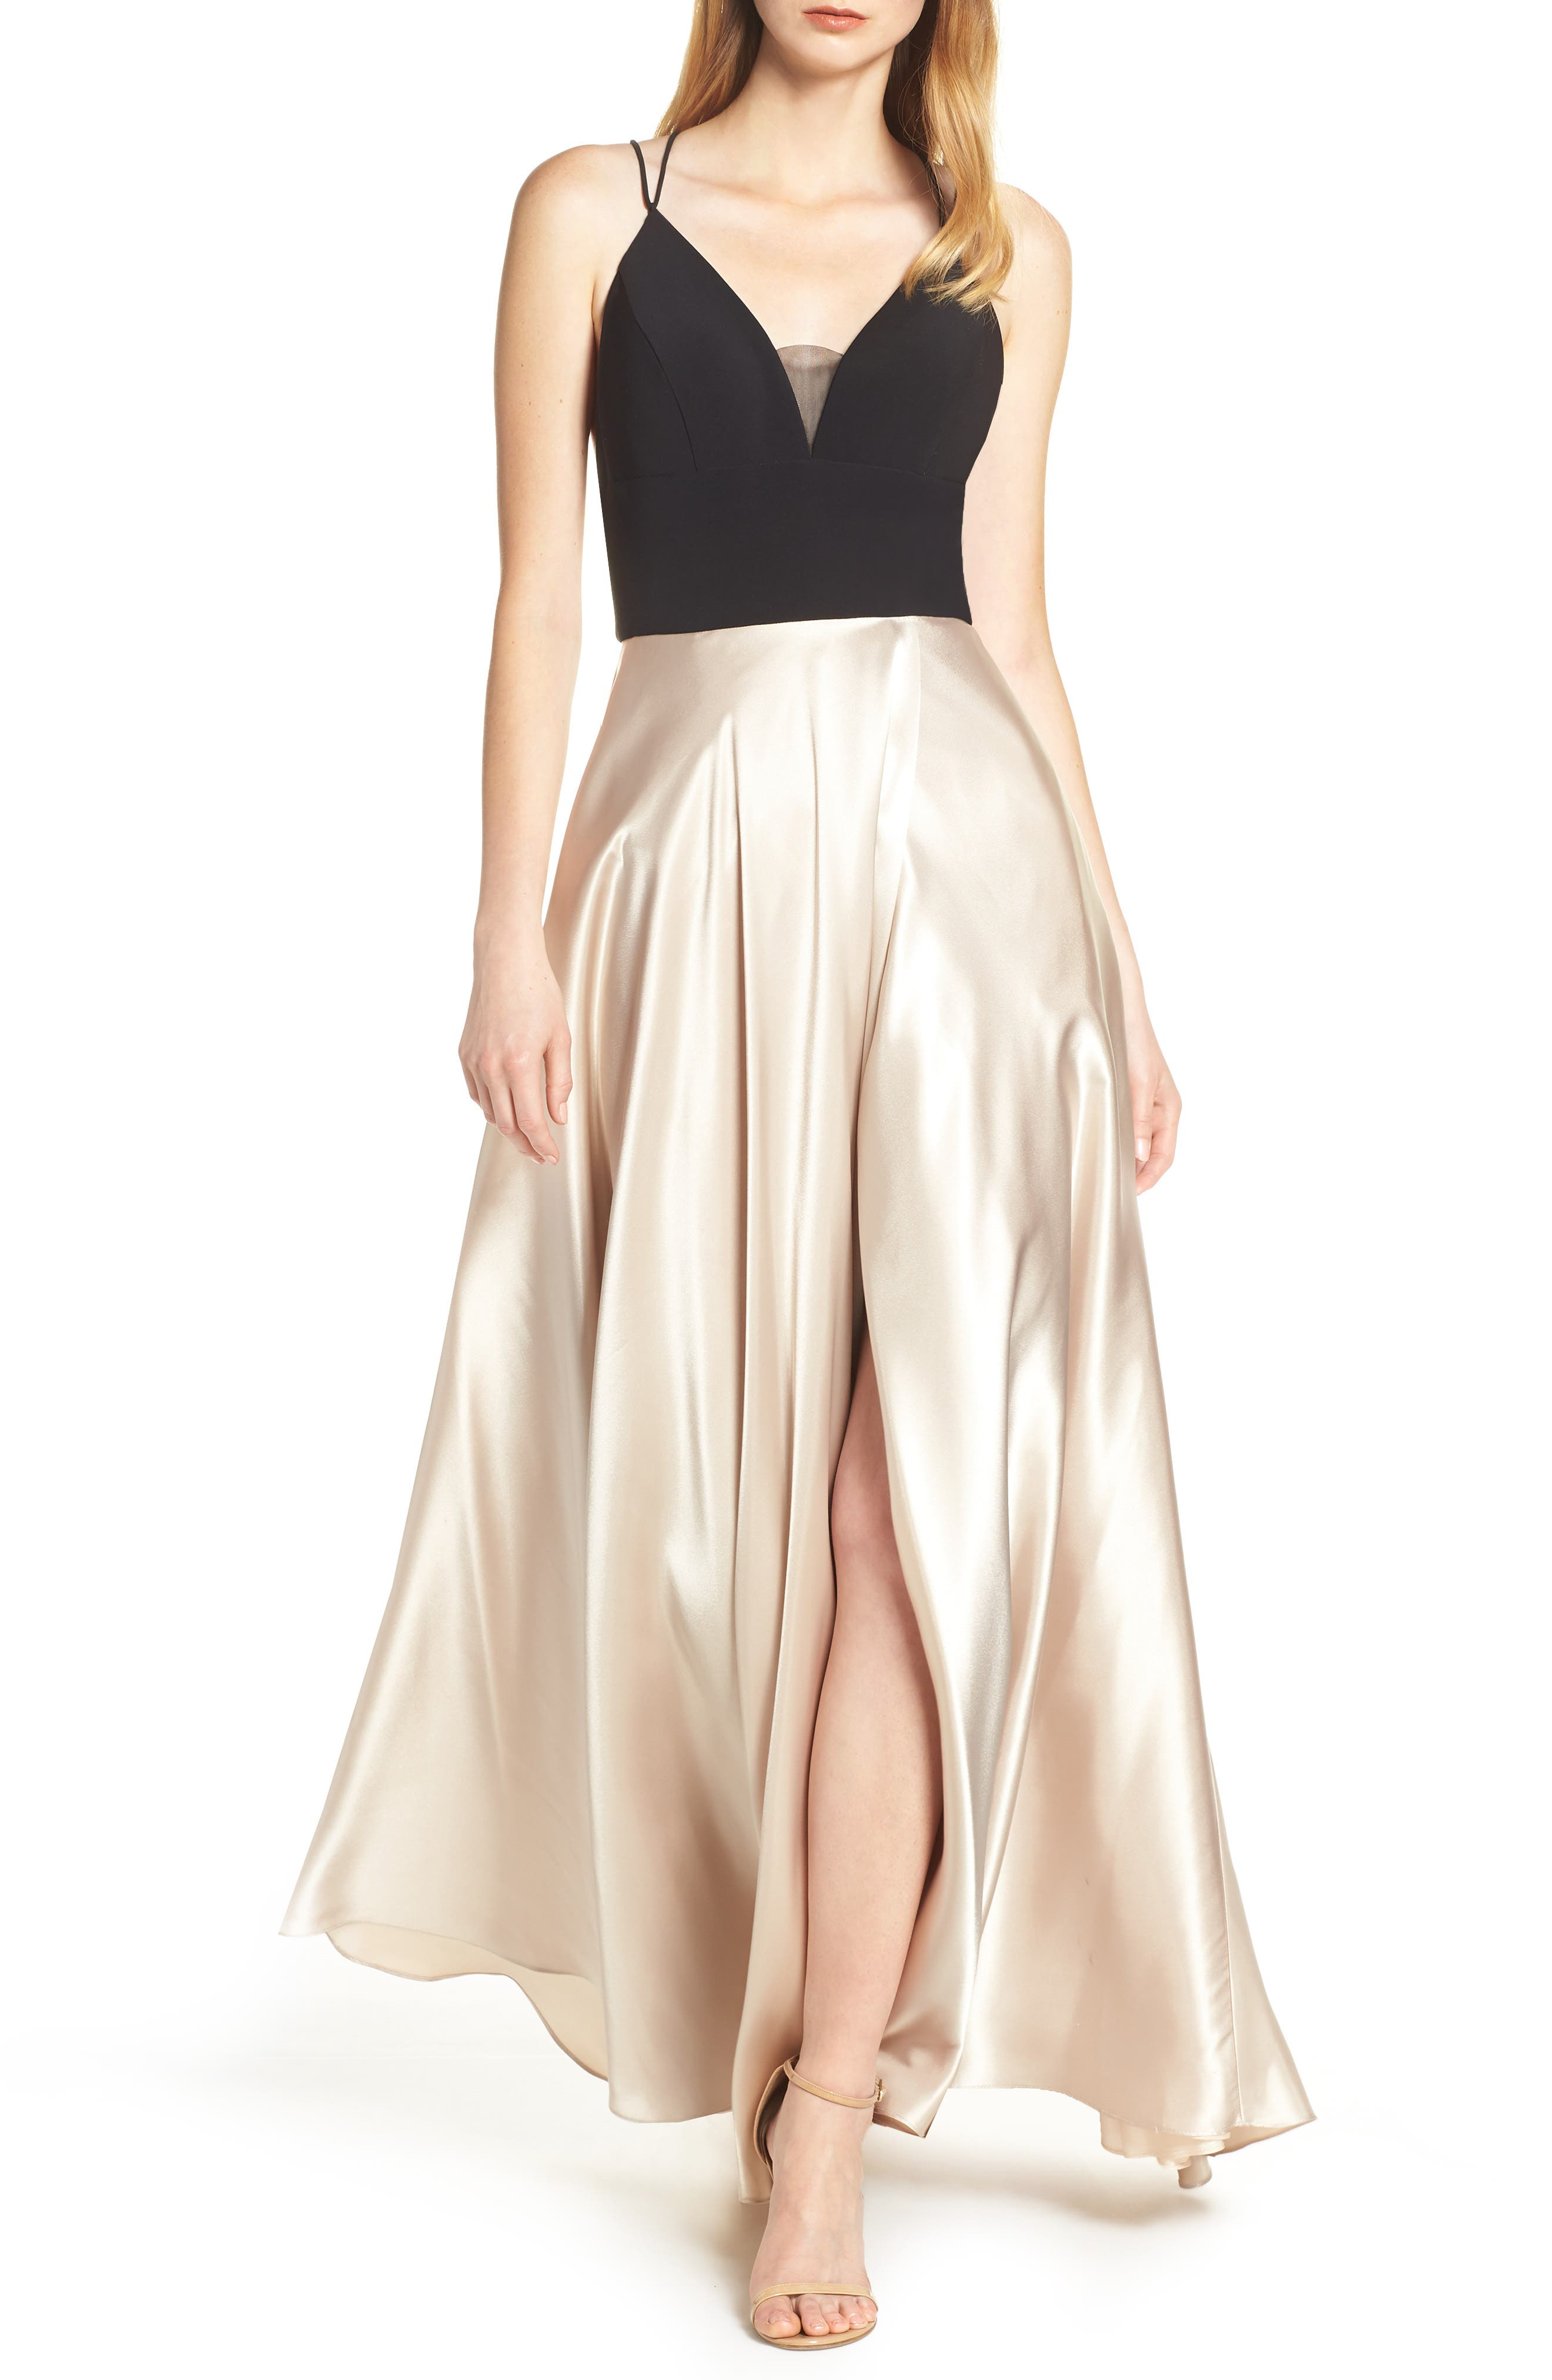 BLONDIE NITES Strappy Back Crepe & Charmeuse Evening Dress, Main, color, BLACK/ GOLD